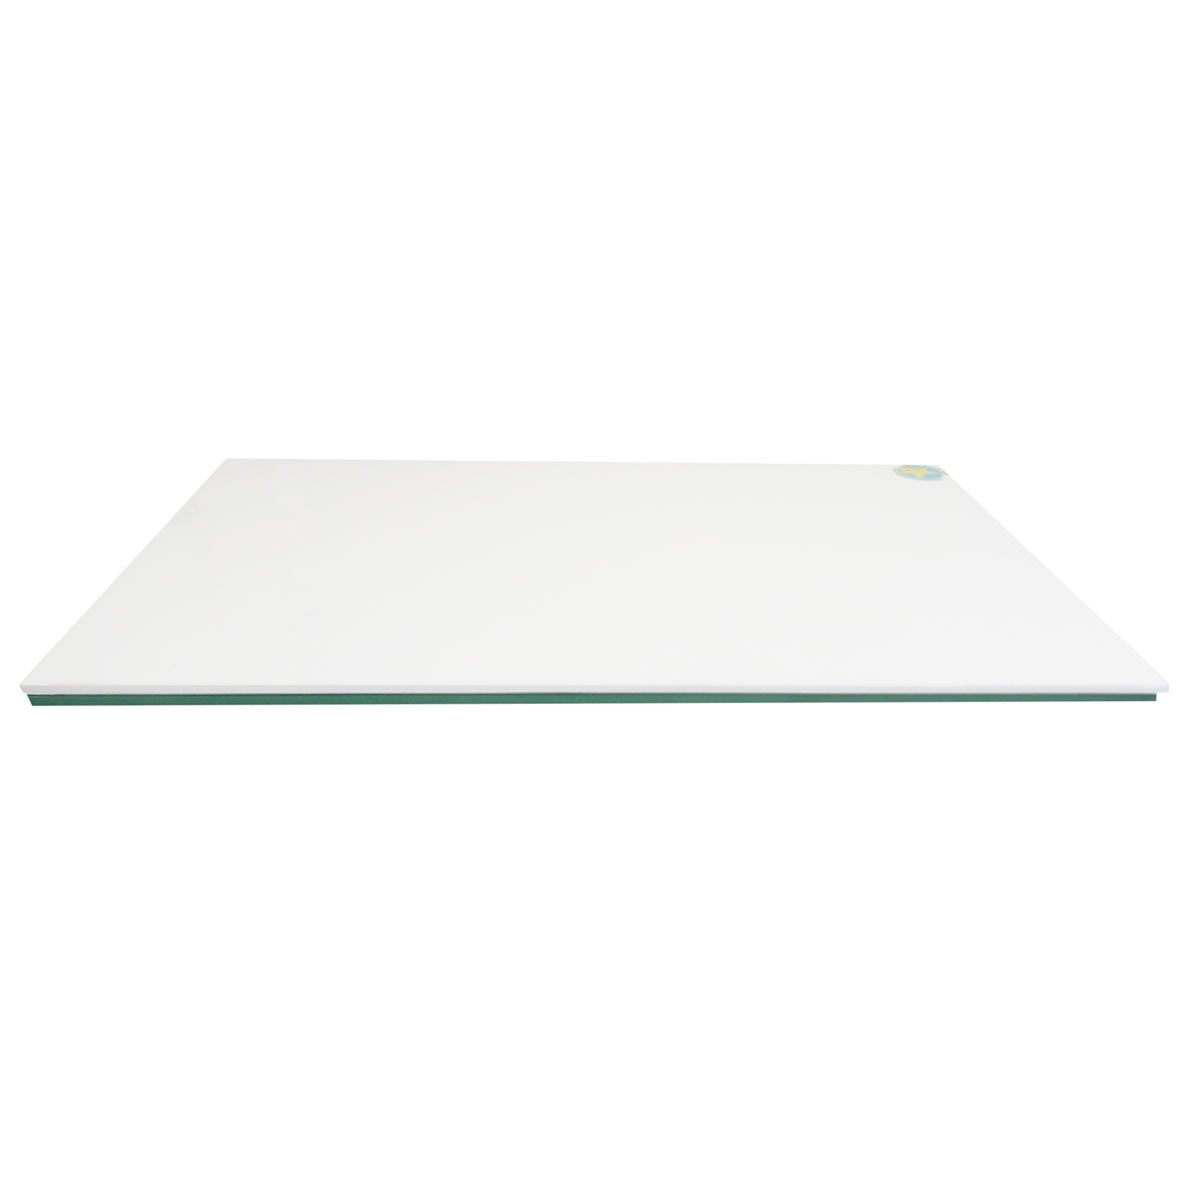 Placa para Modelagem (25 x 40cm) - BlueStar